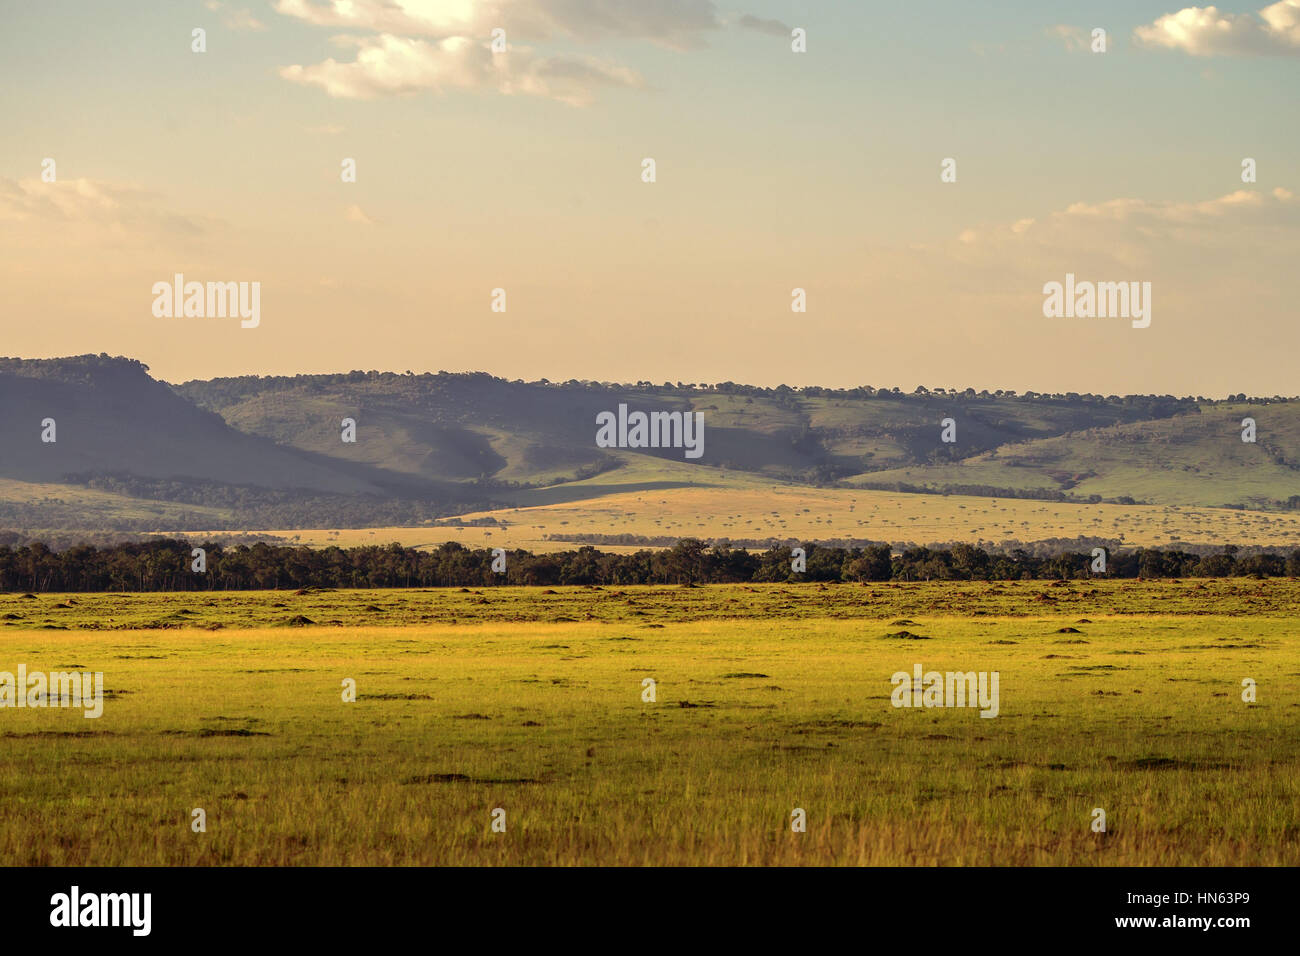 Scenic African savannah landscape in Maasai Mara, Kenya - Stock Image